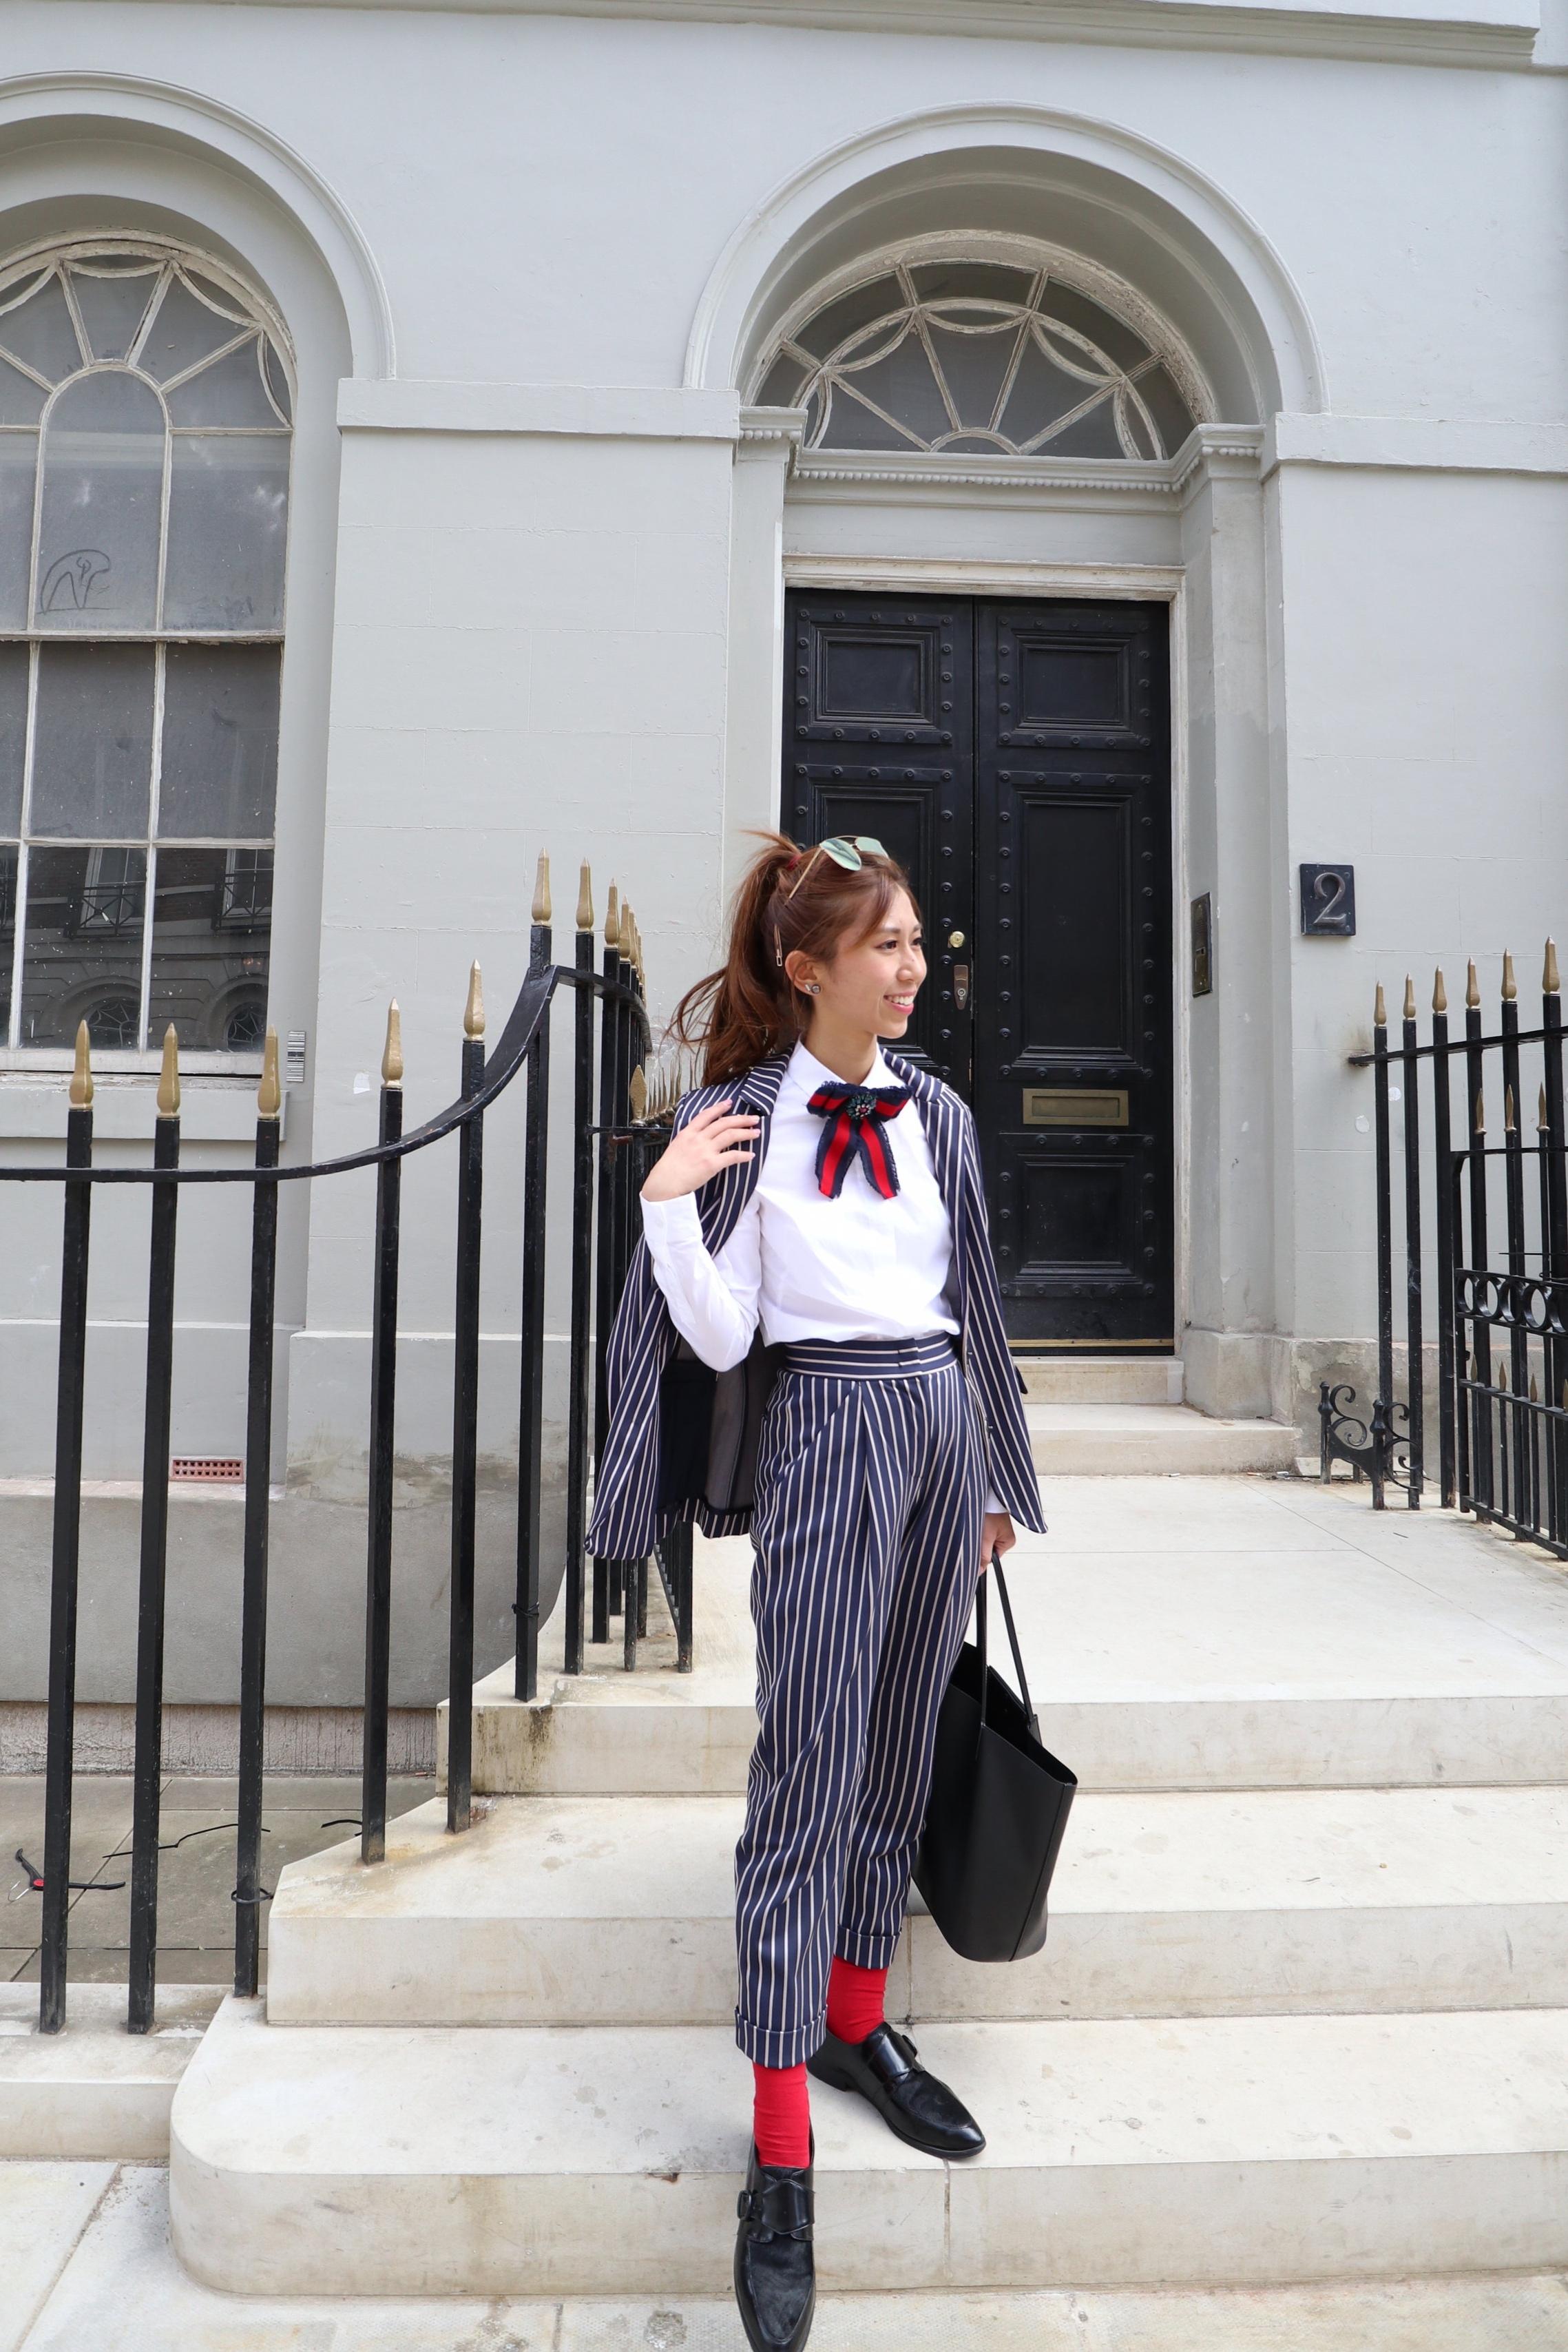 #FollowDearPostmanTo London Travel Lookbook